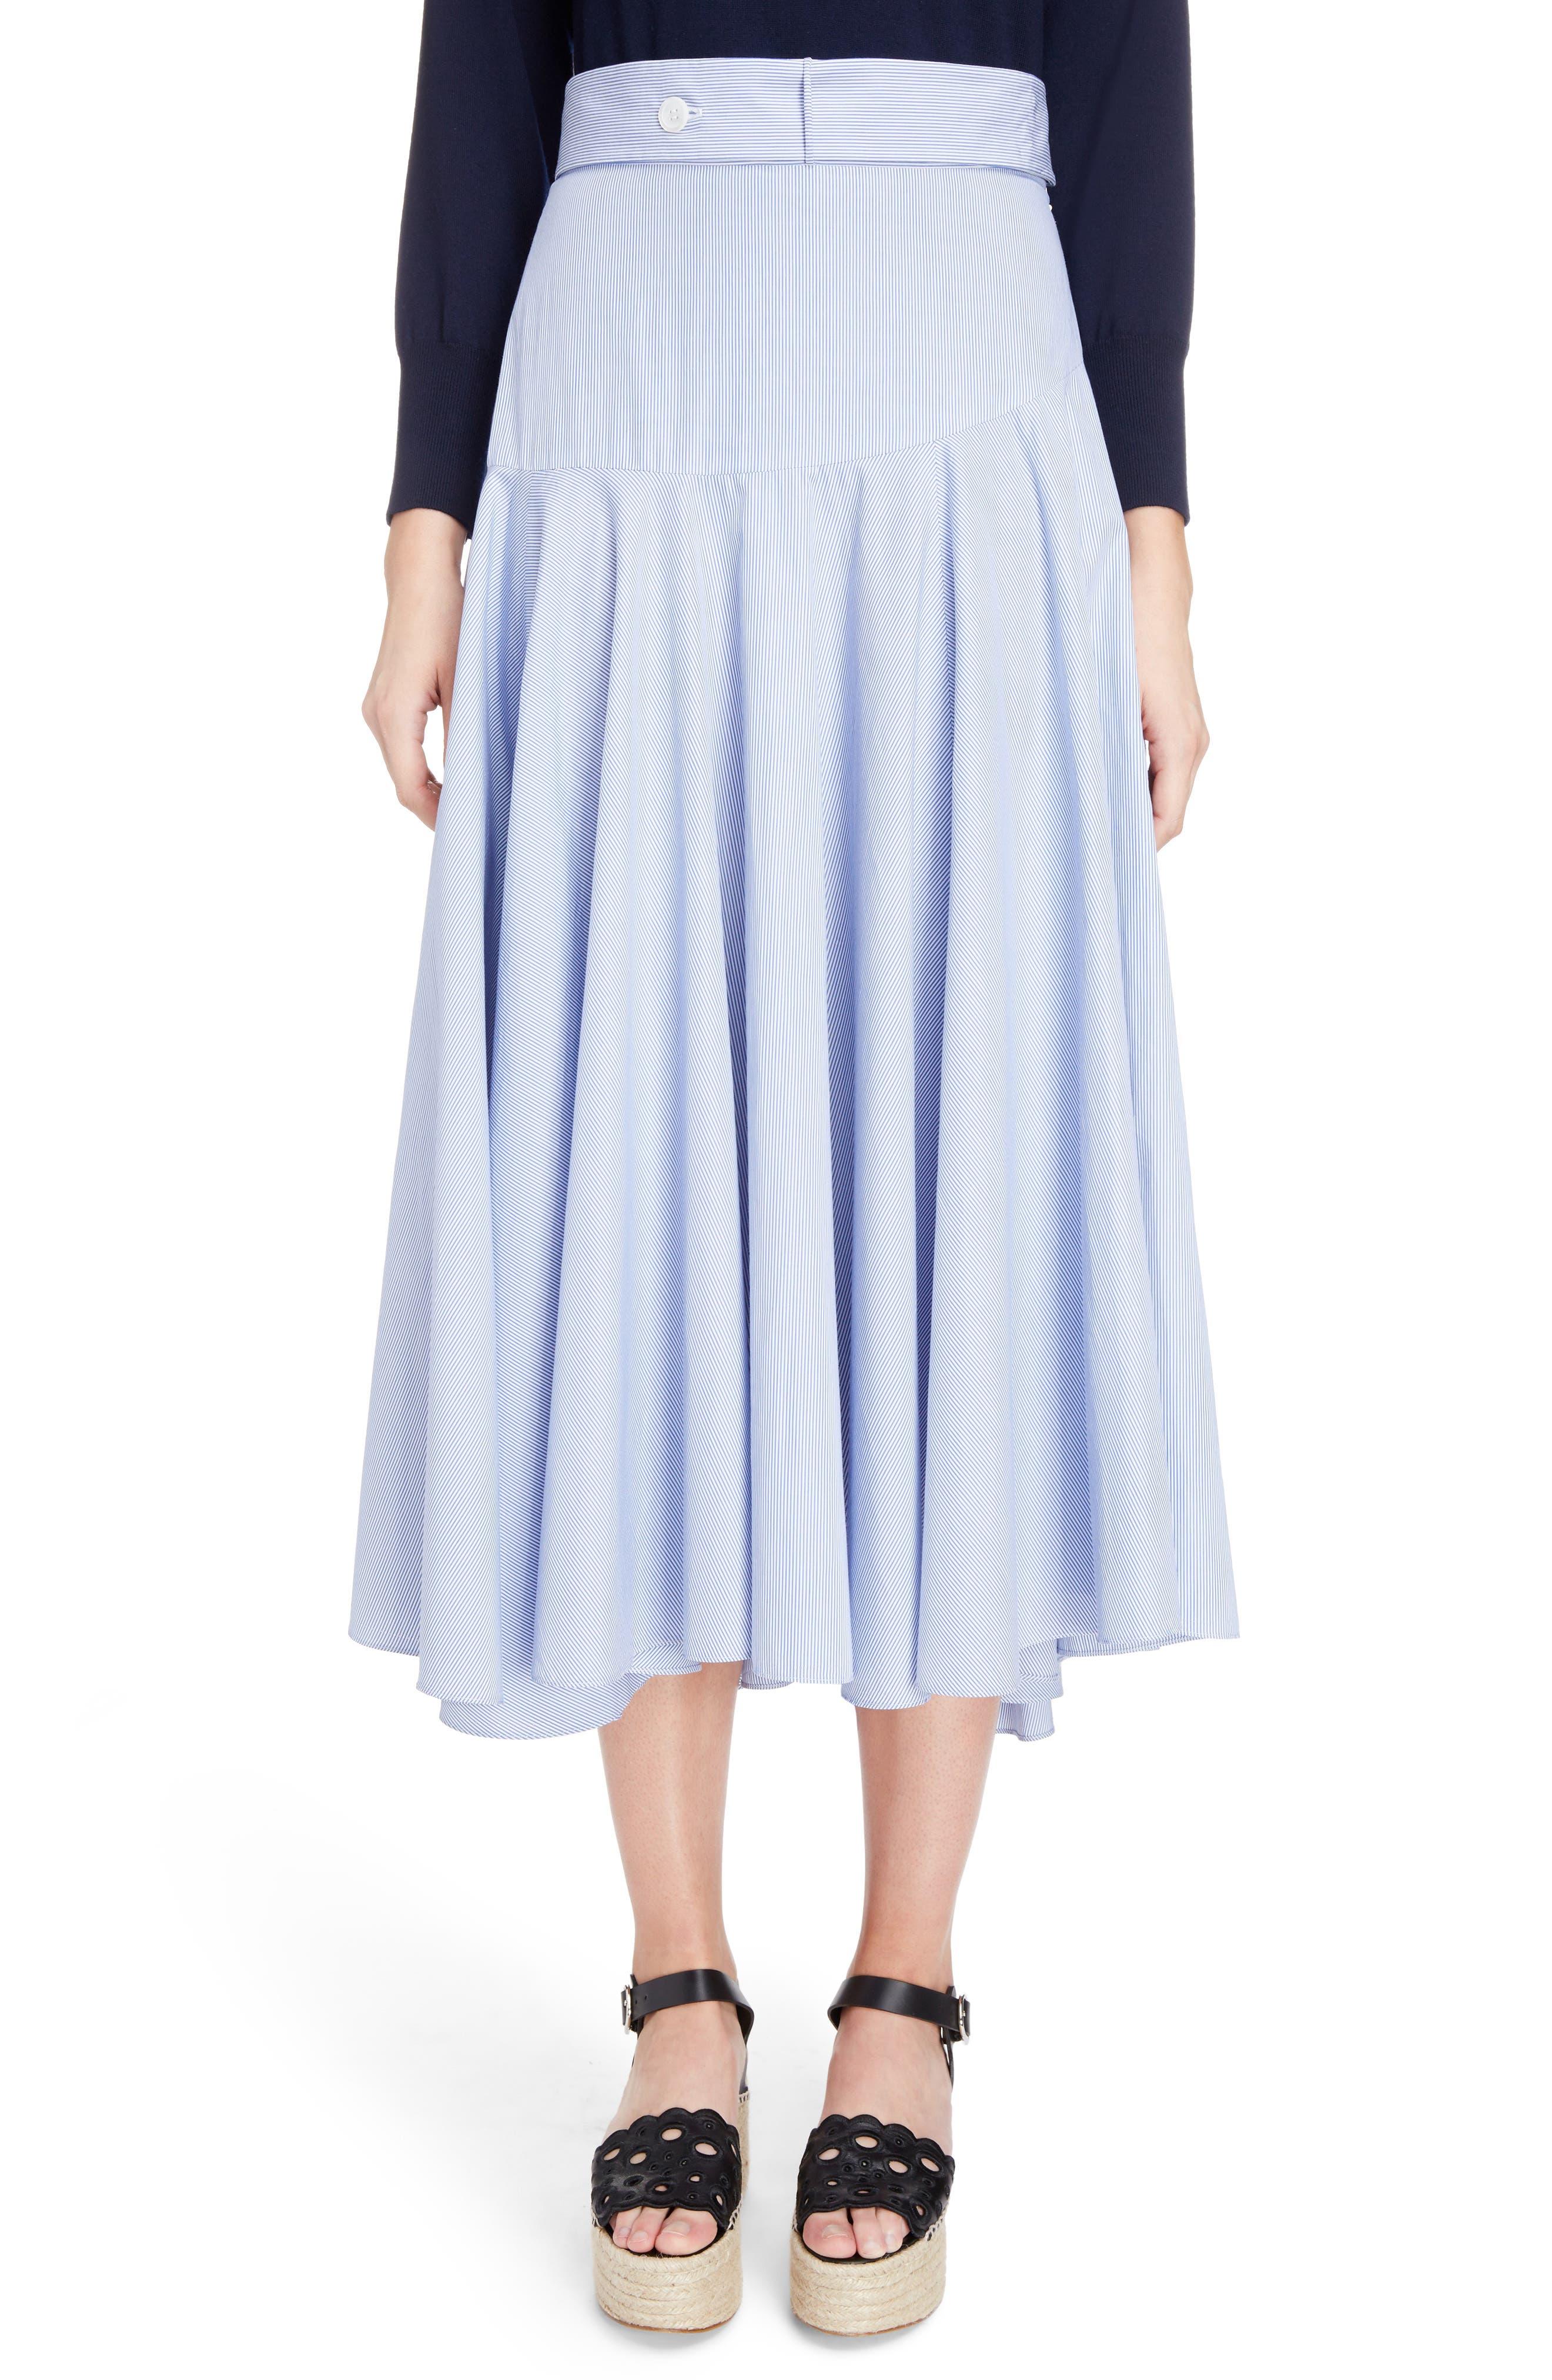 Loewe Stripe Cotton Skater Skirt